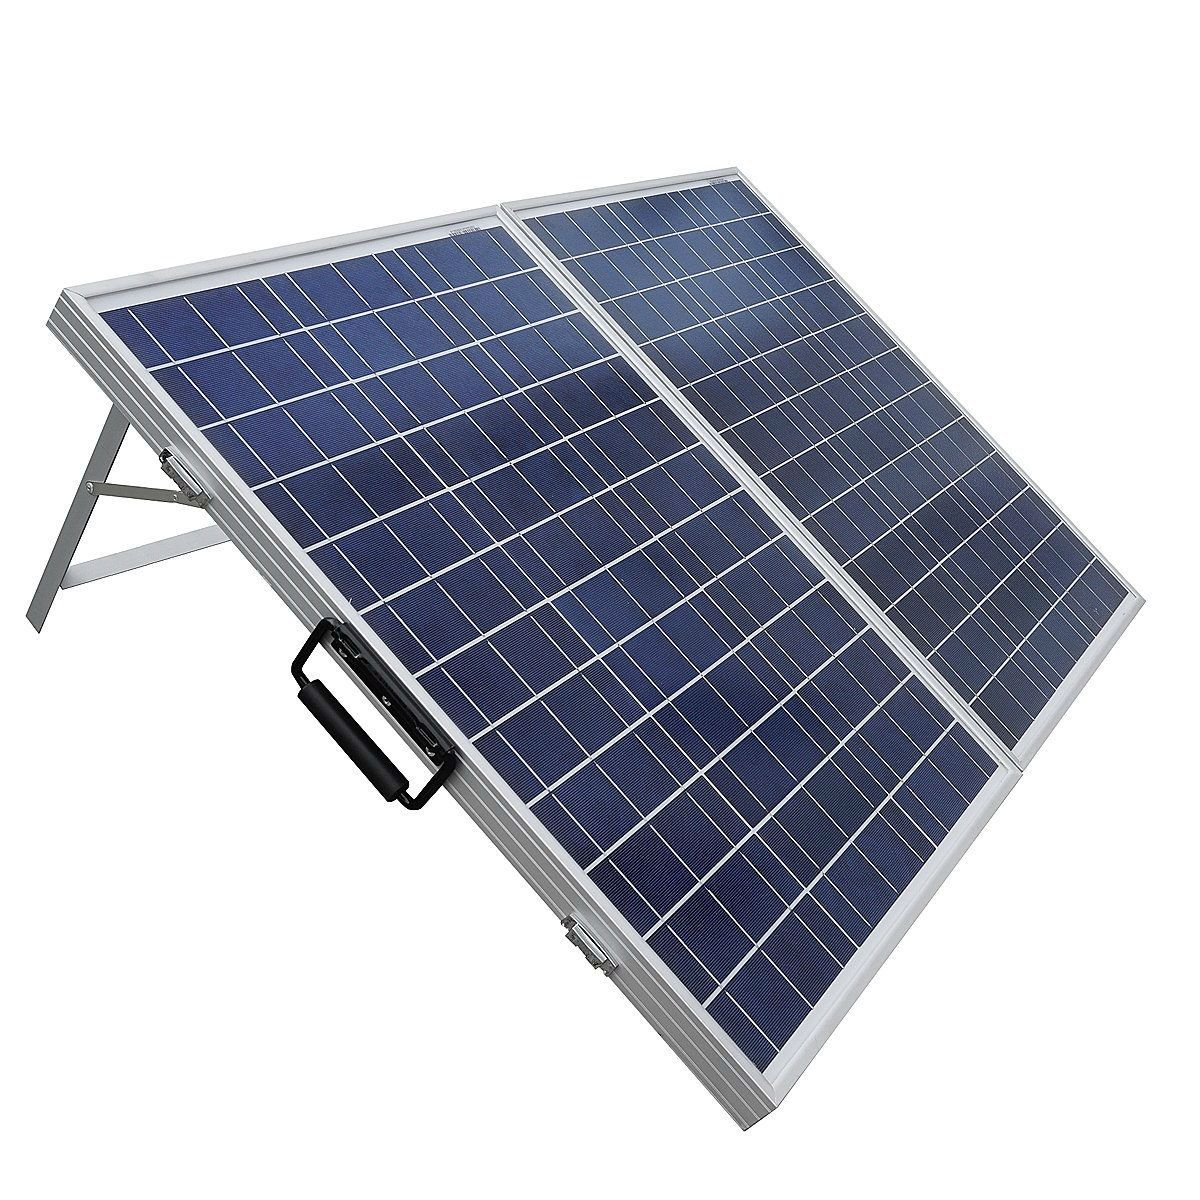 100 Watt Portable Folding Solar Panel 12v Battery Charger Best Solar Panels Solar Panels For Home Solar Panels